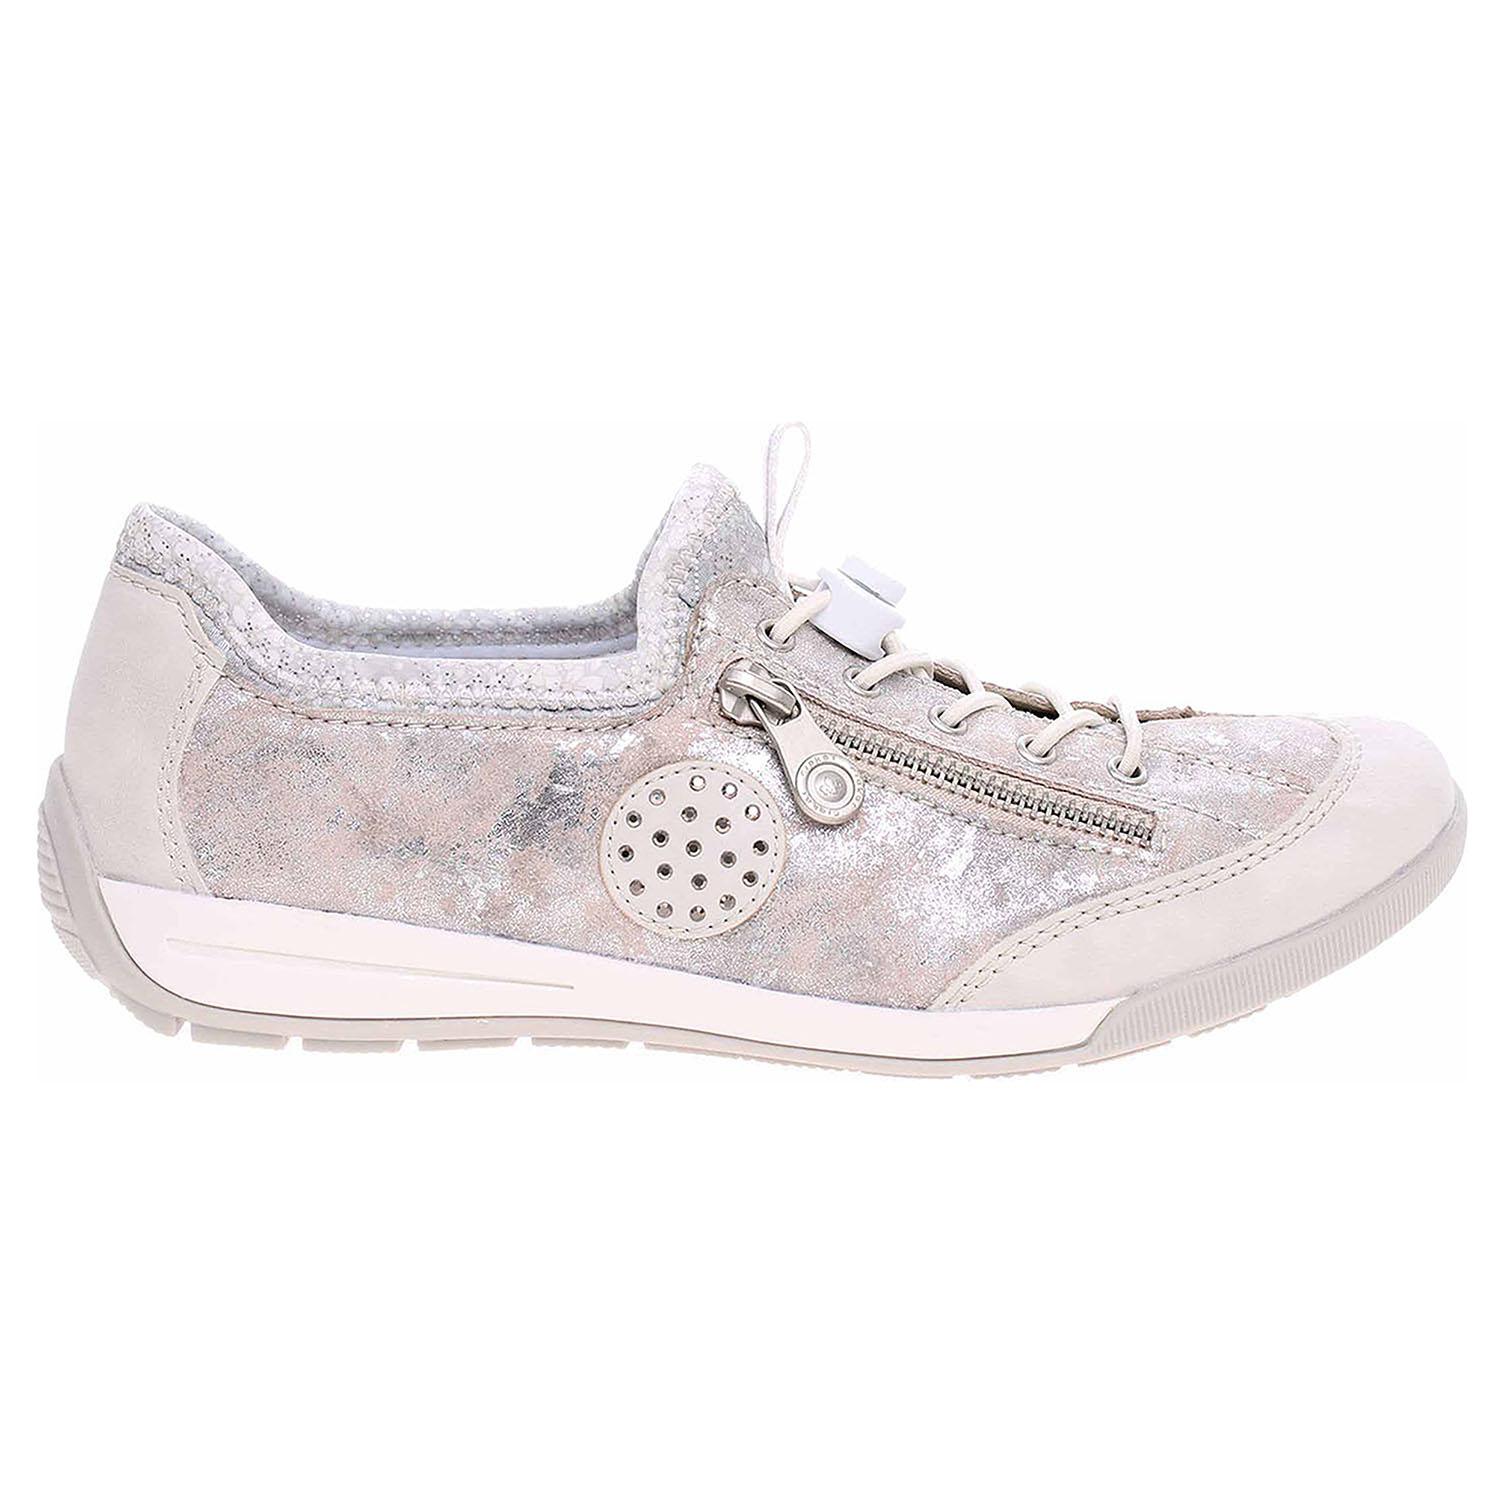 Ecco Rieker dámská obuv M3063-81 weiss kombi 23200909 a6923b5c5c1